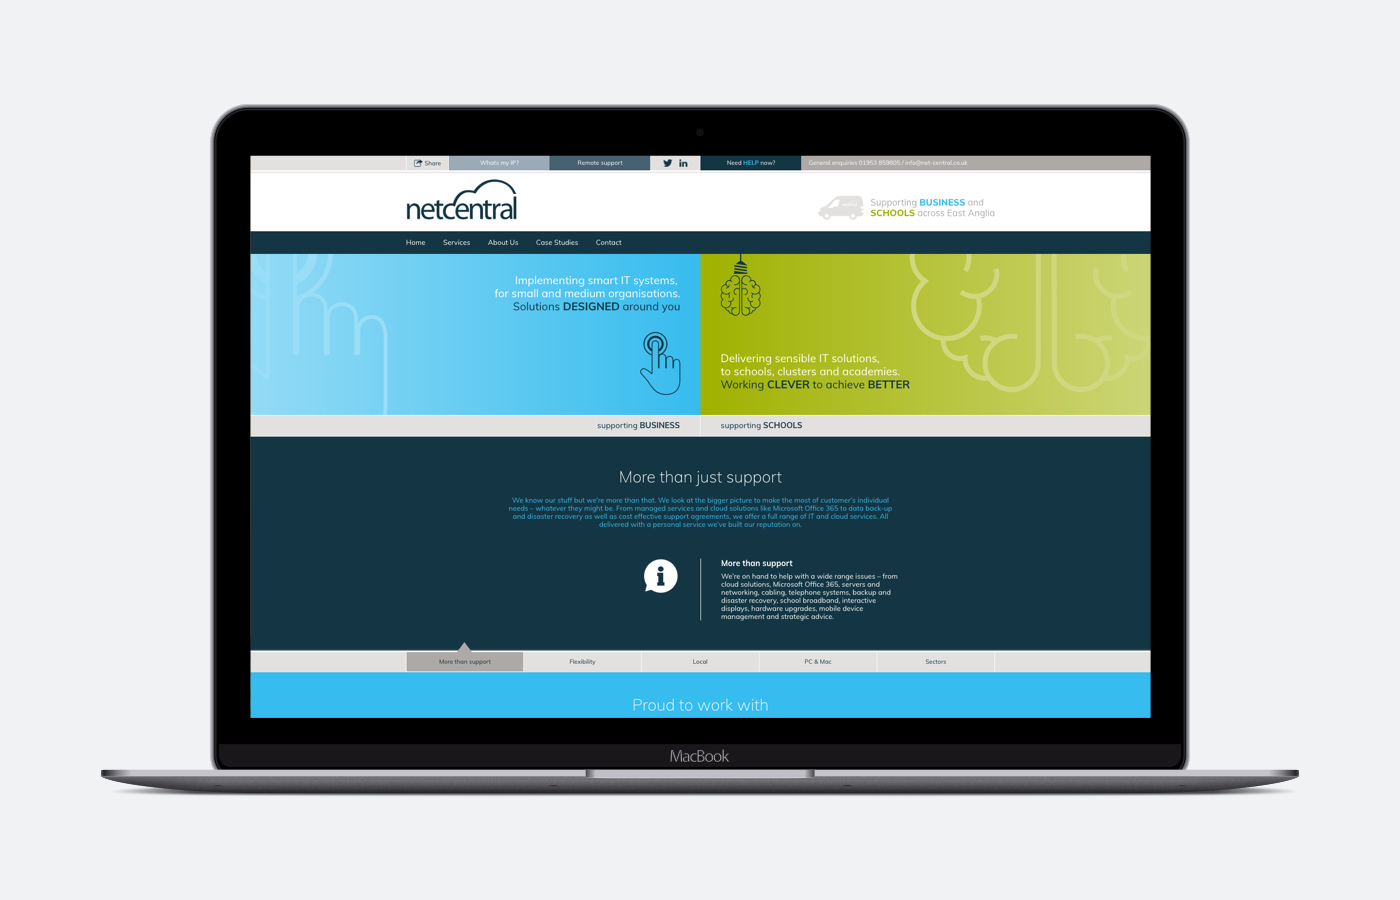 Netcentral website updated